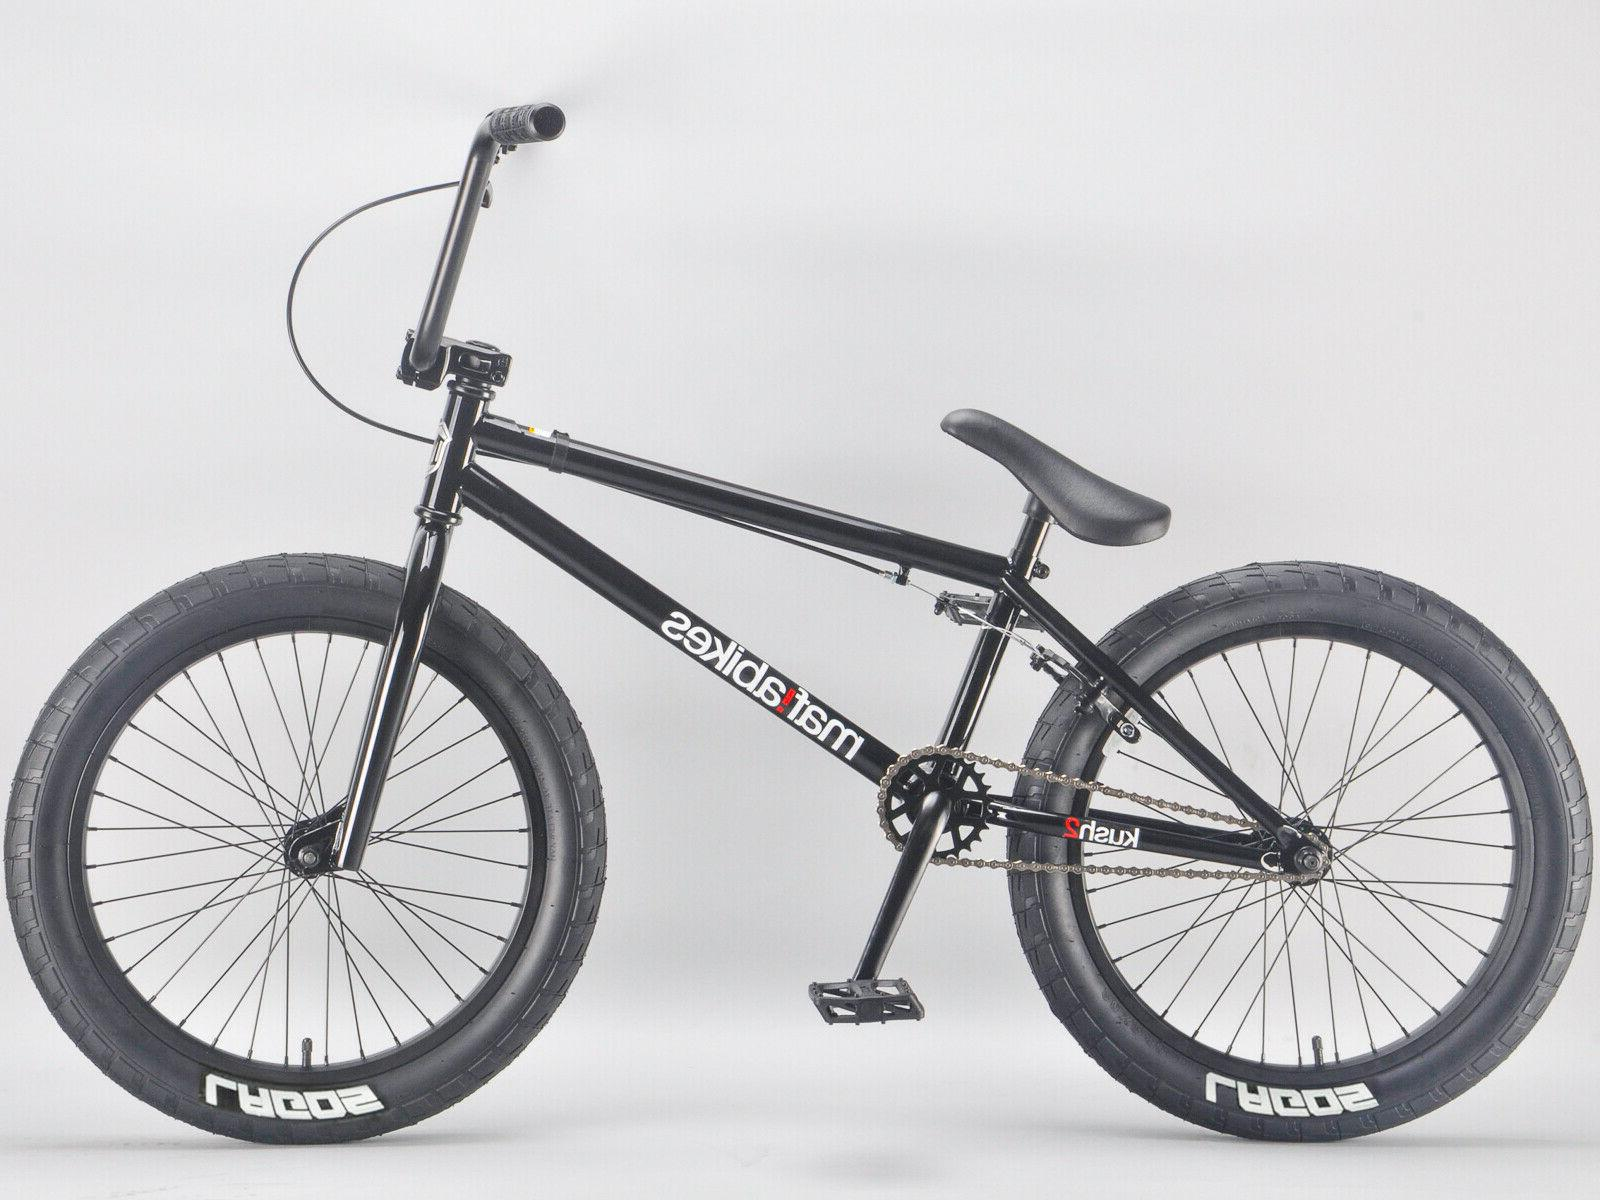 Mafiabikes KUSH 2 20 inch bmx bike boys girls available in m